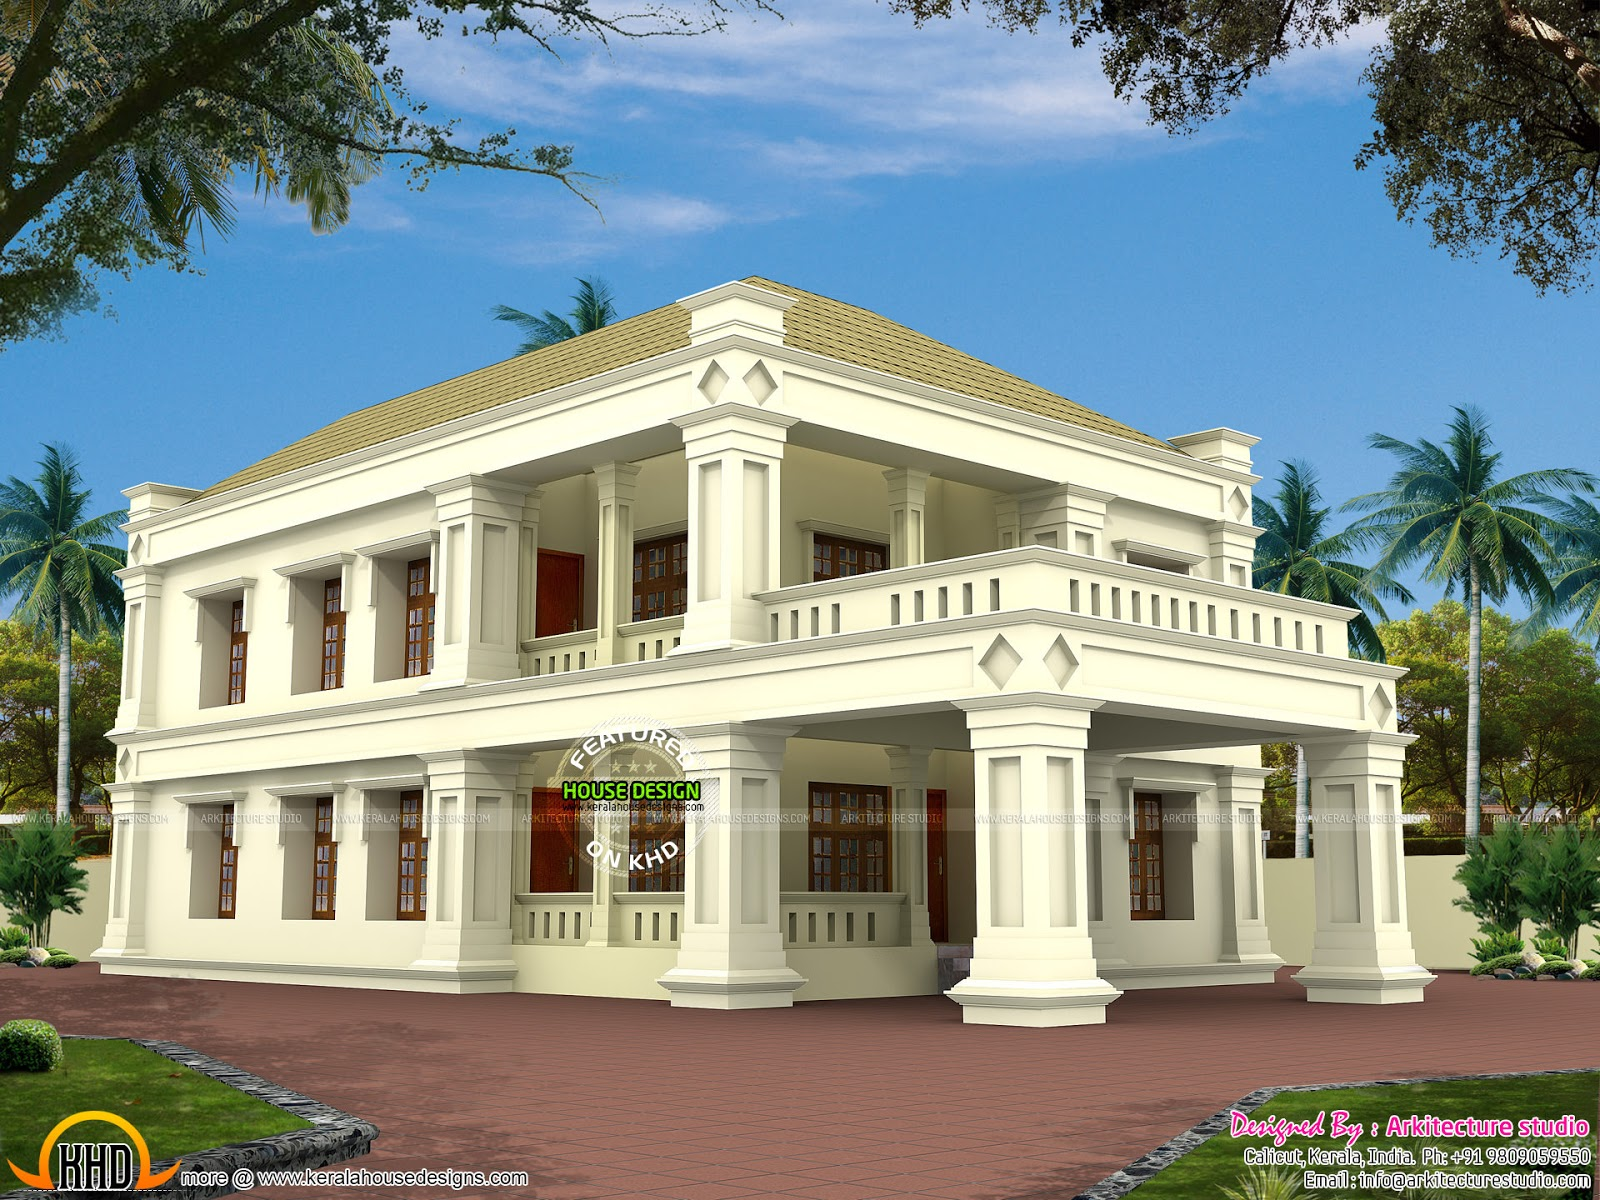 Pillar Designs For Home Interiors October 2015 Kerala Home Design And Floor Plans